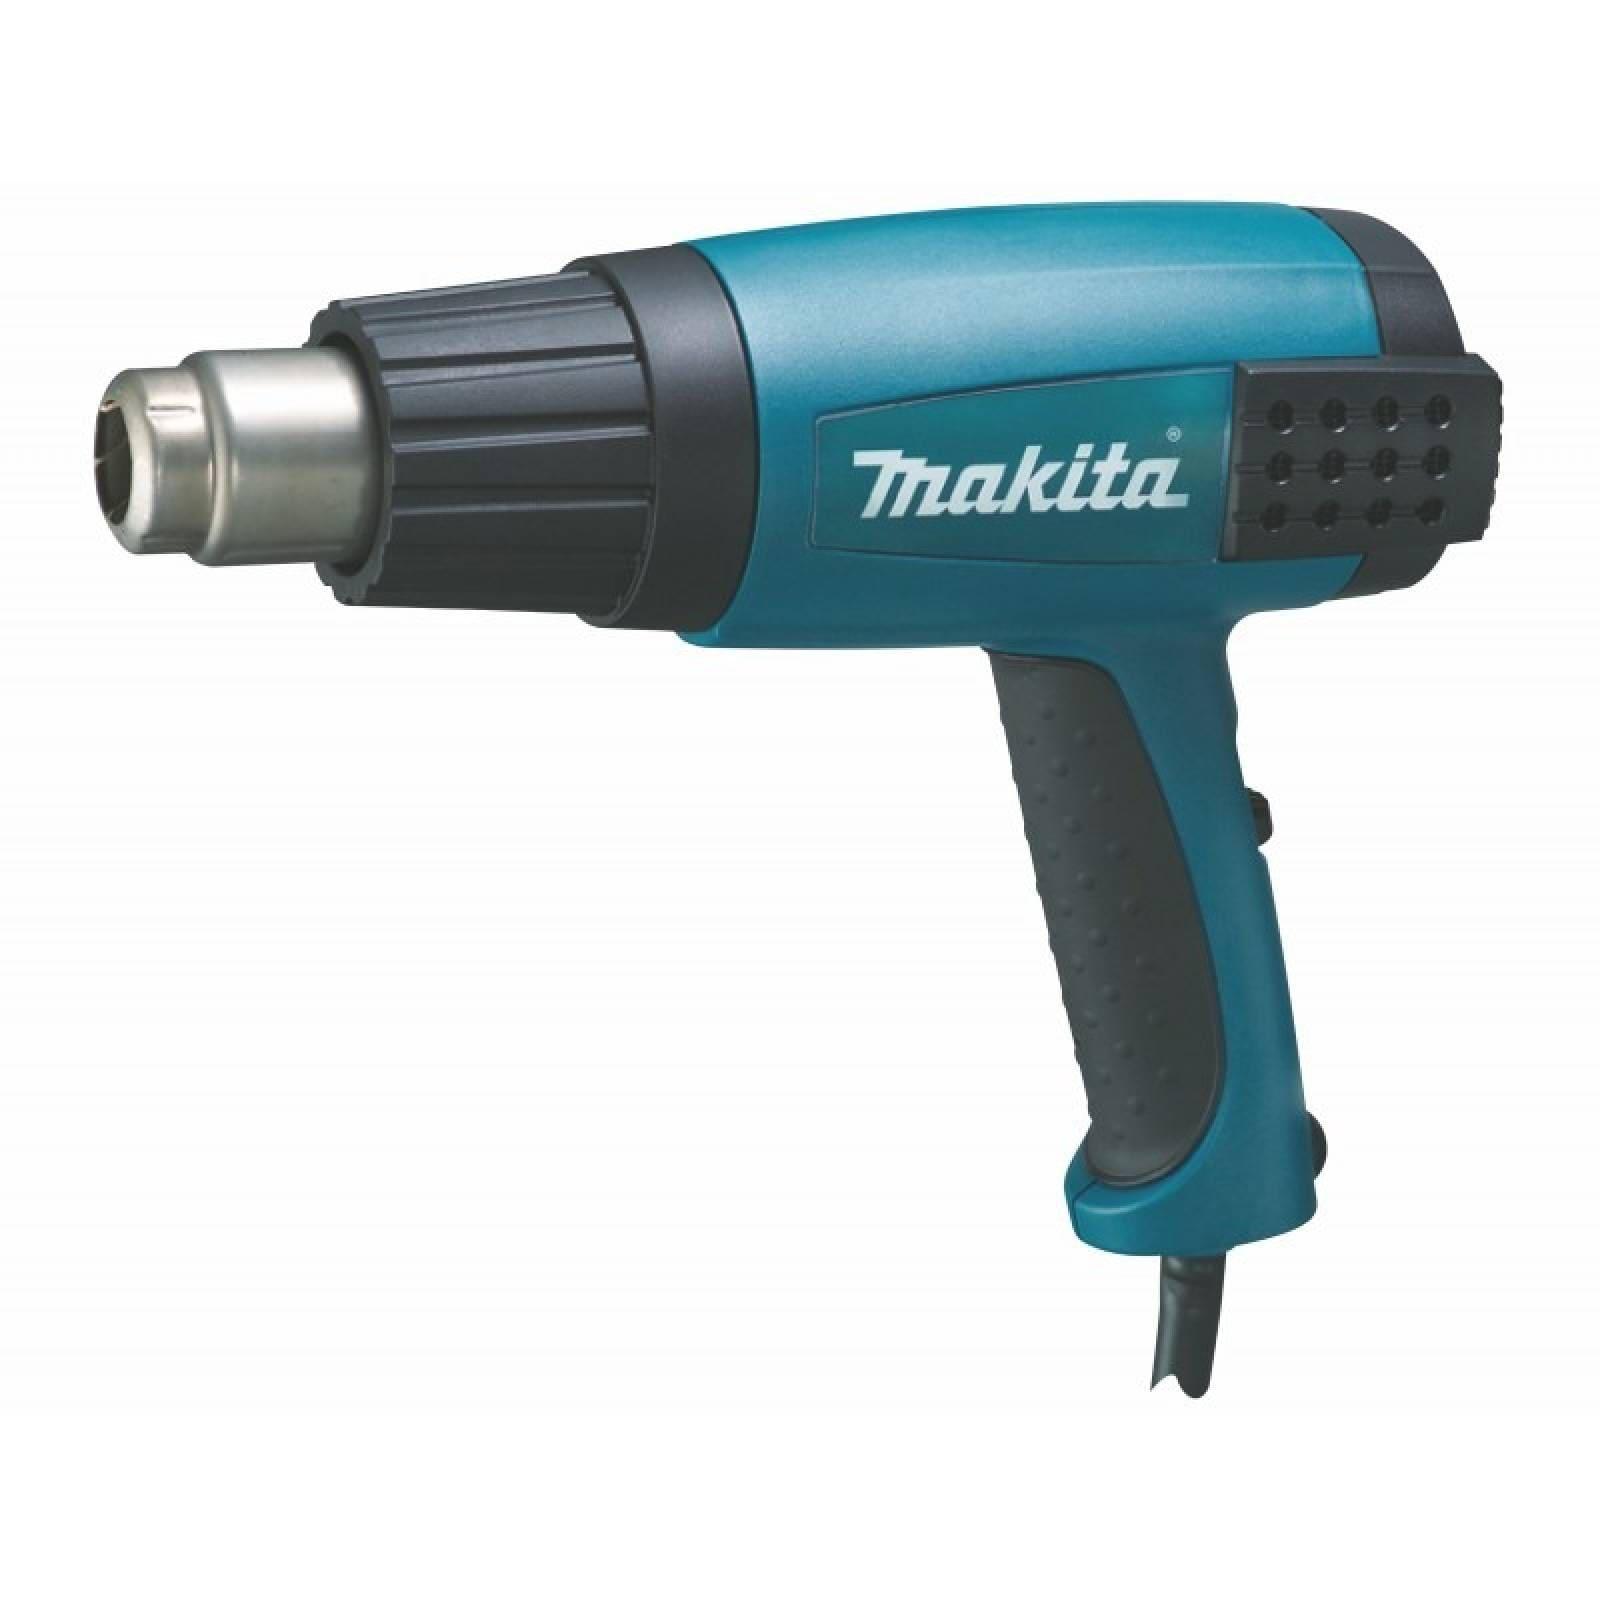 Pistola De Calor Pistola Eléctrica Makita HG6020 1500W